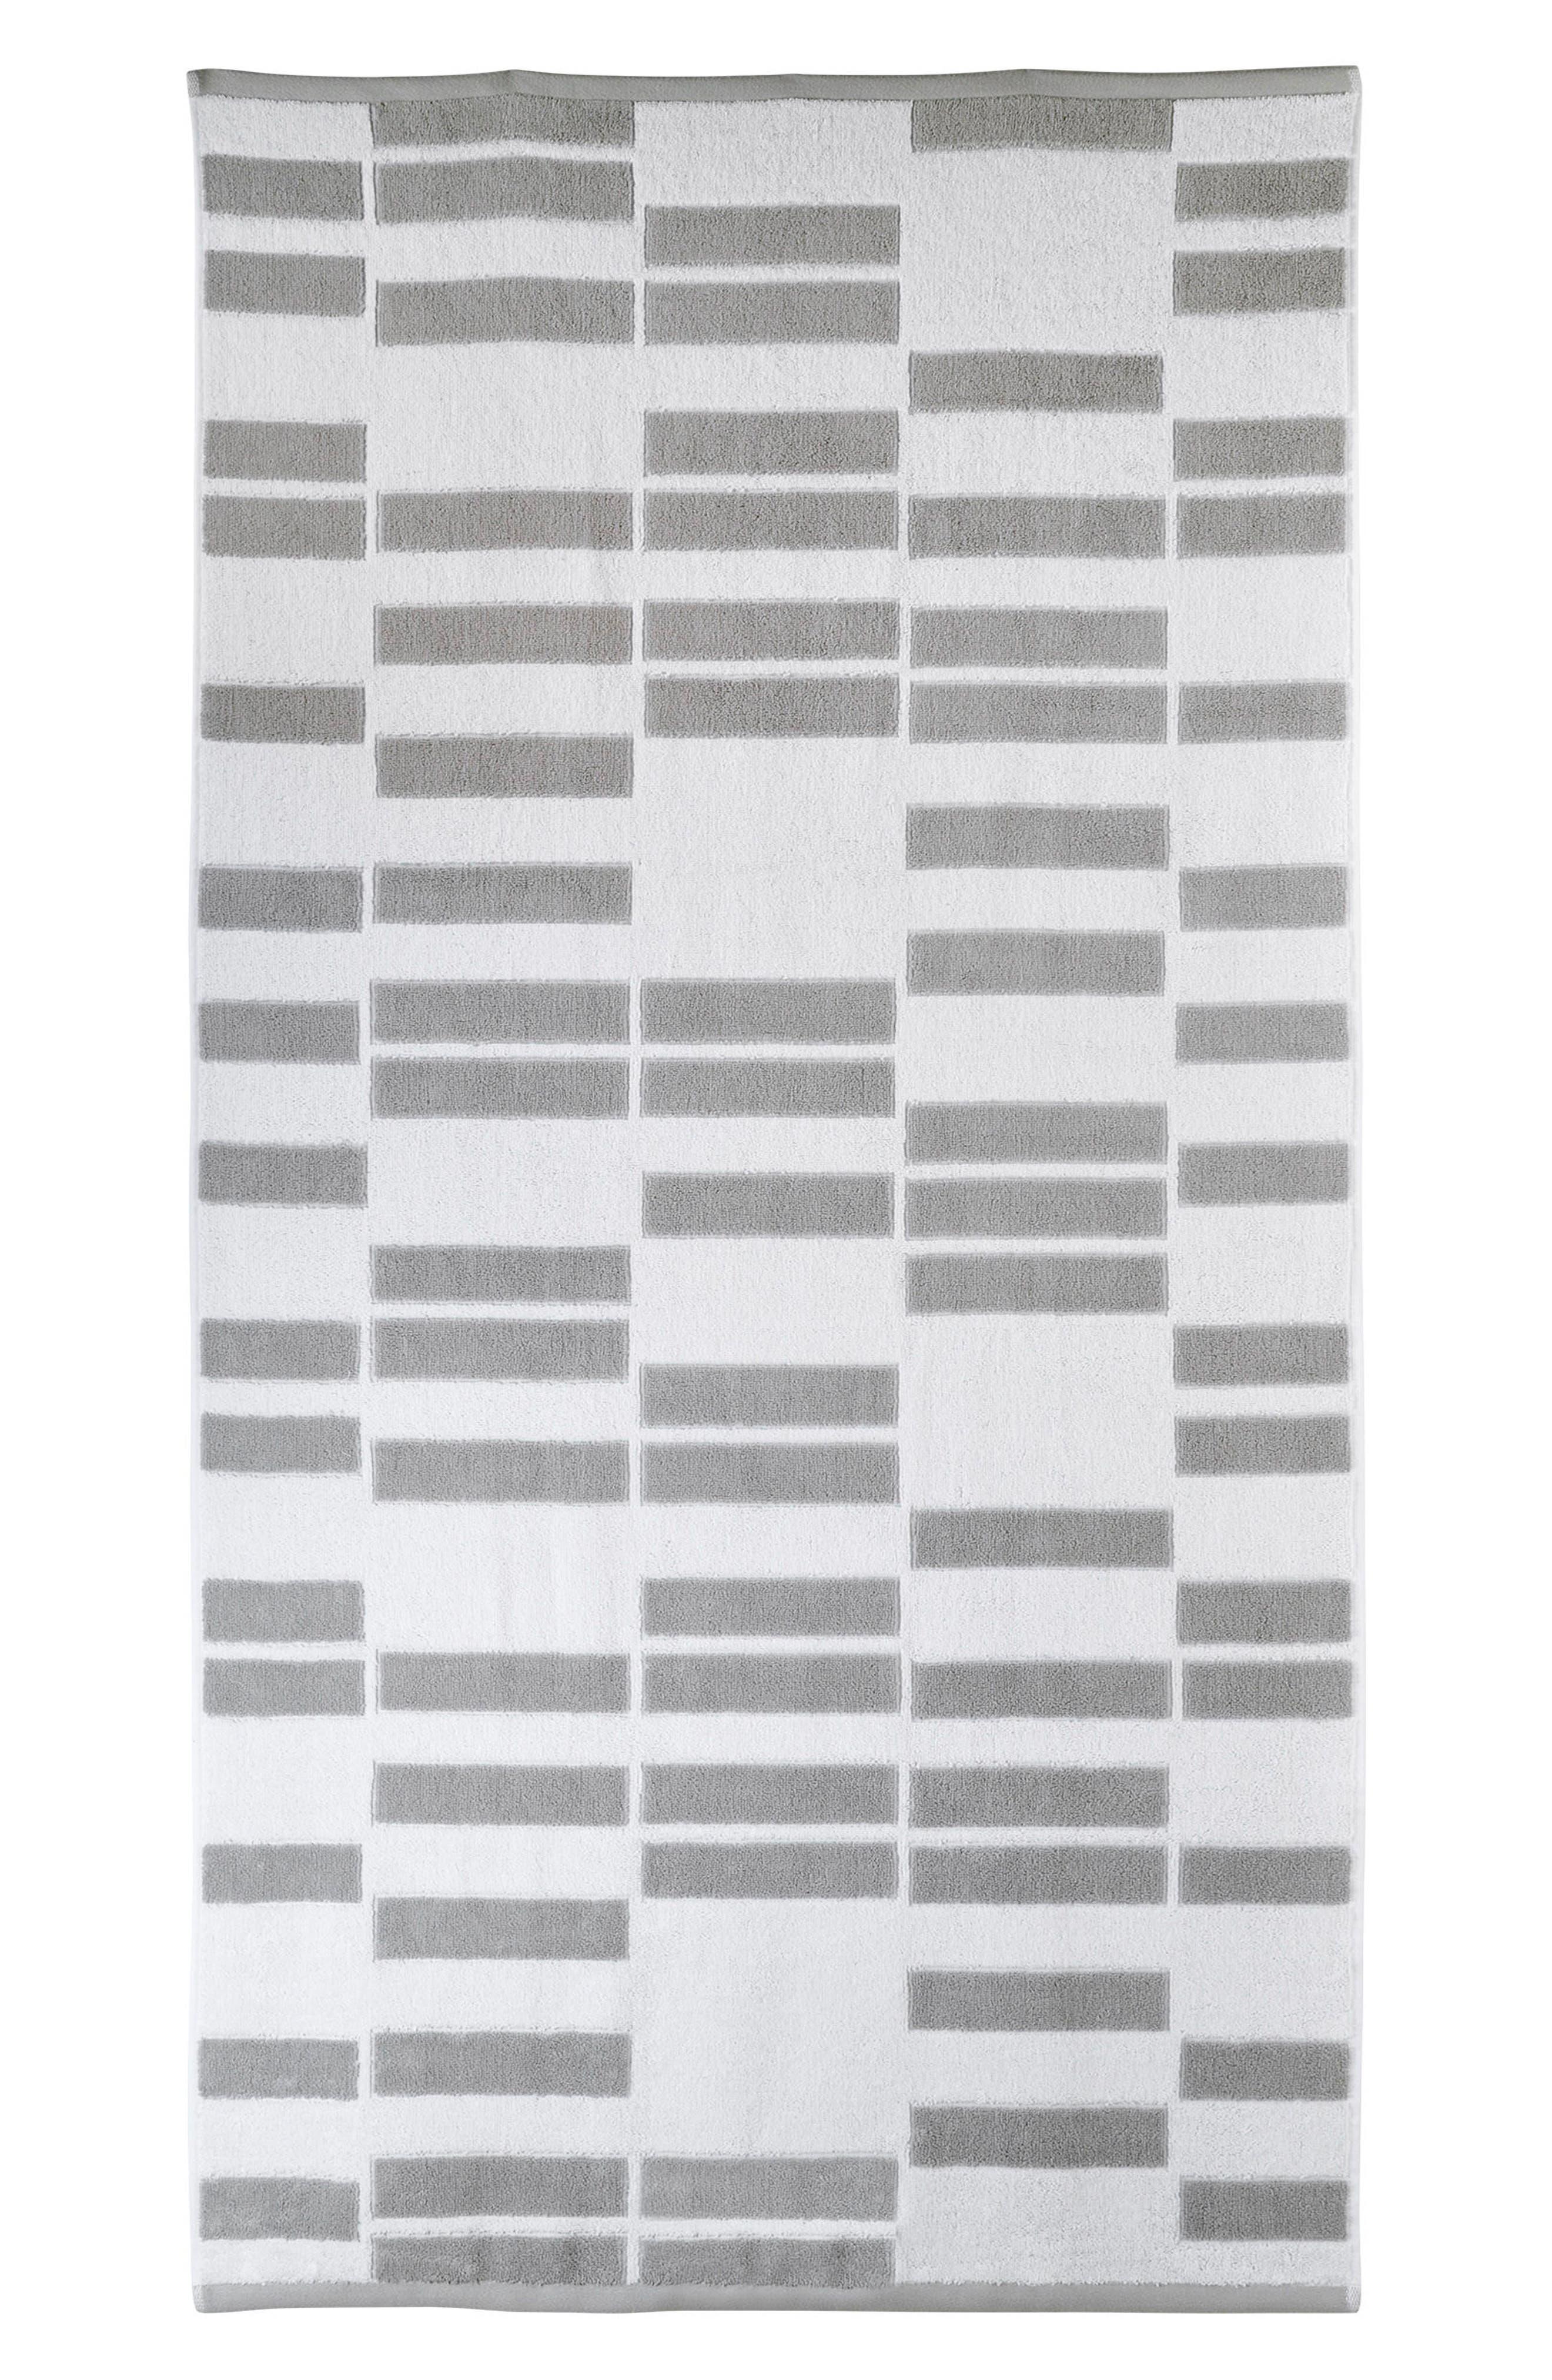 High Rise Fingertip Towel,                             Main thumbnail 1, color,                             White/ Smoke